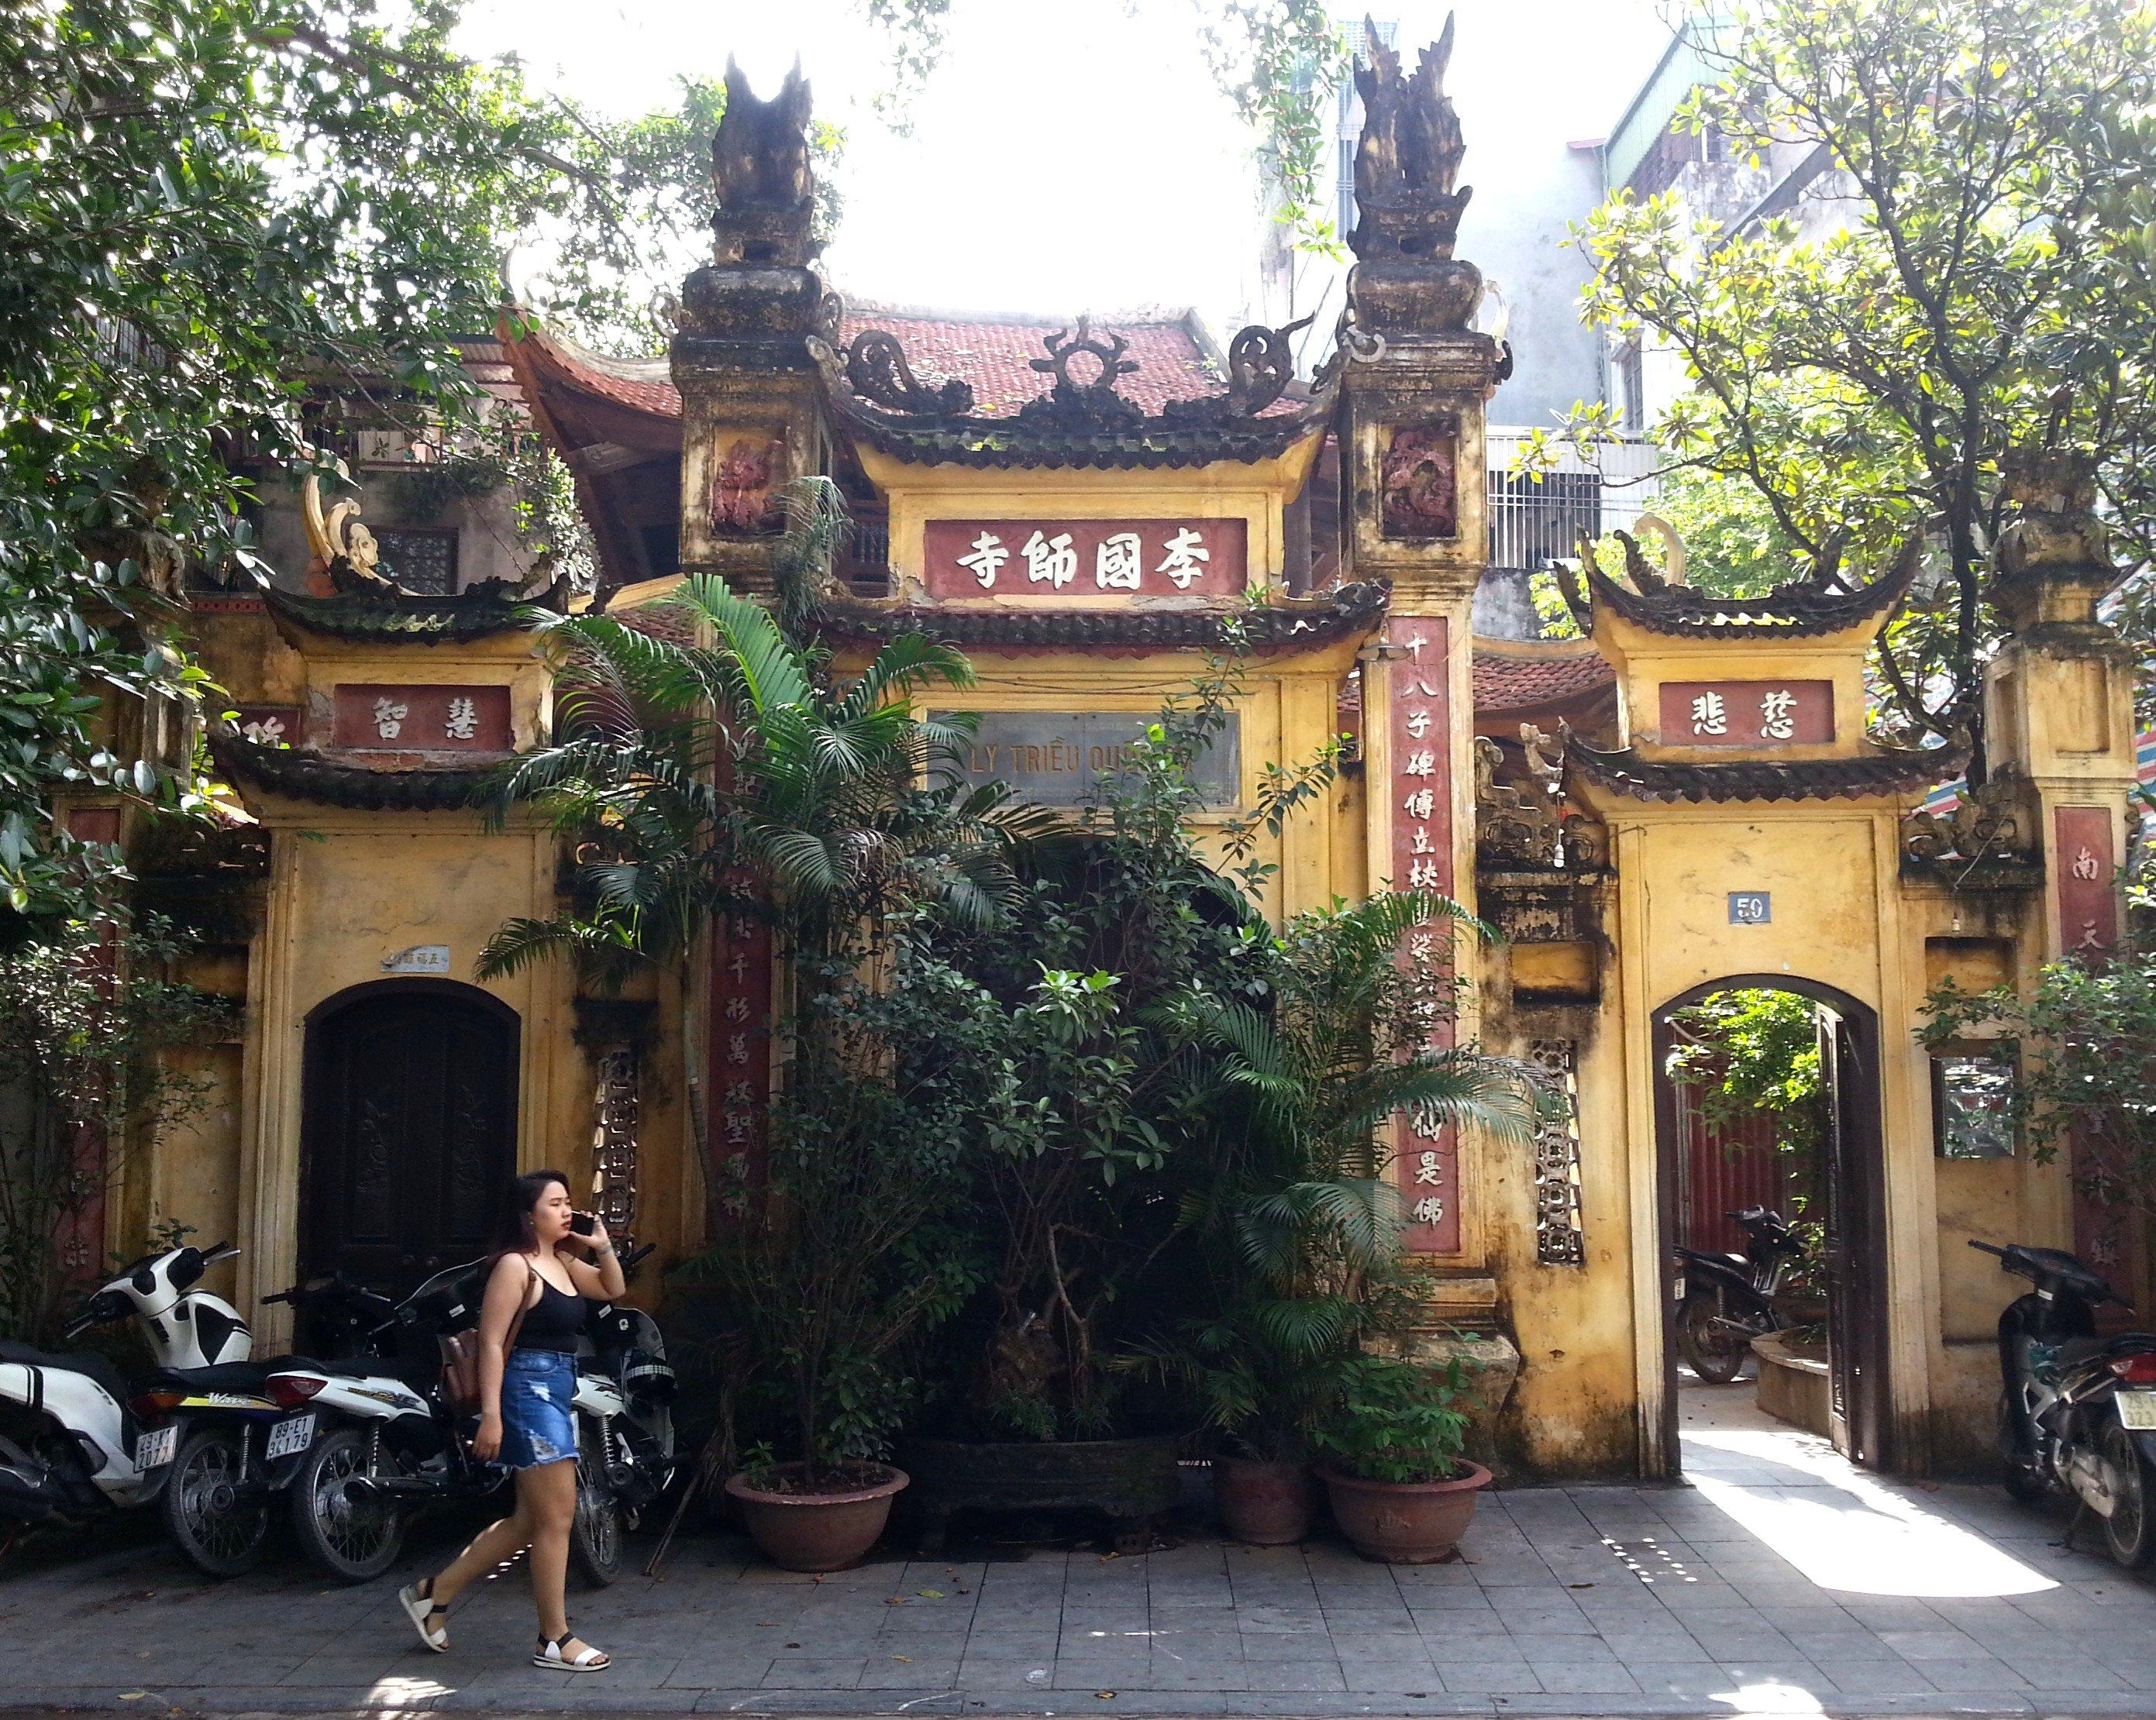 Temple Gates in Hanoi City